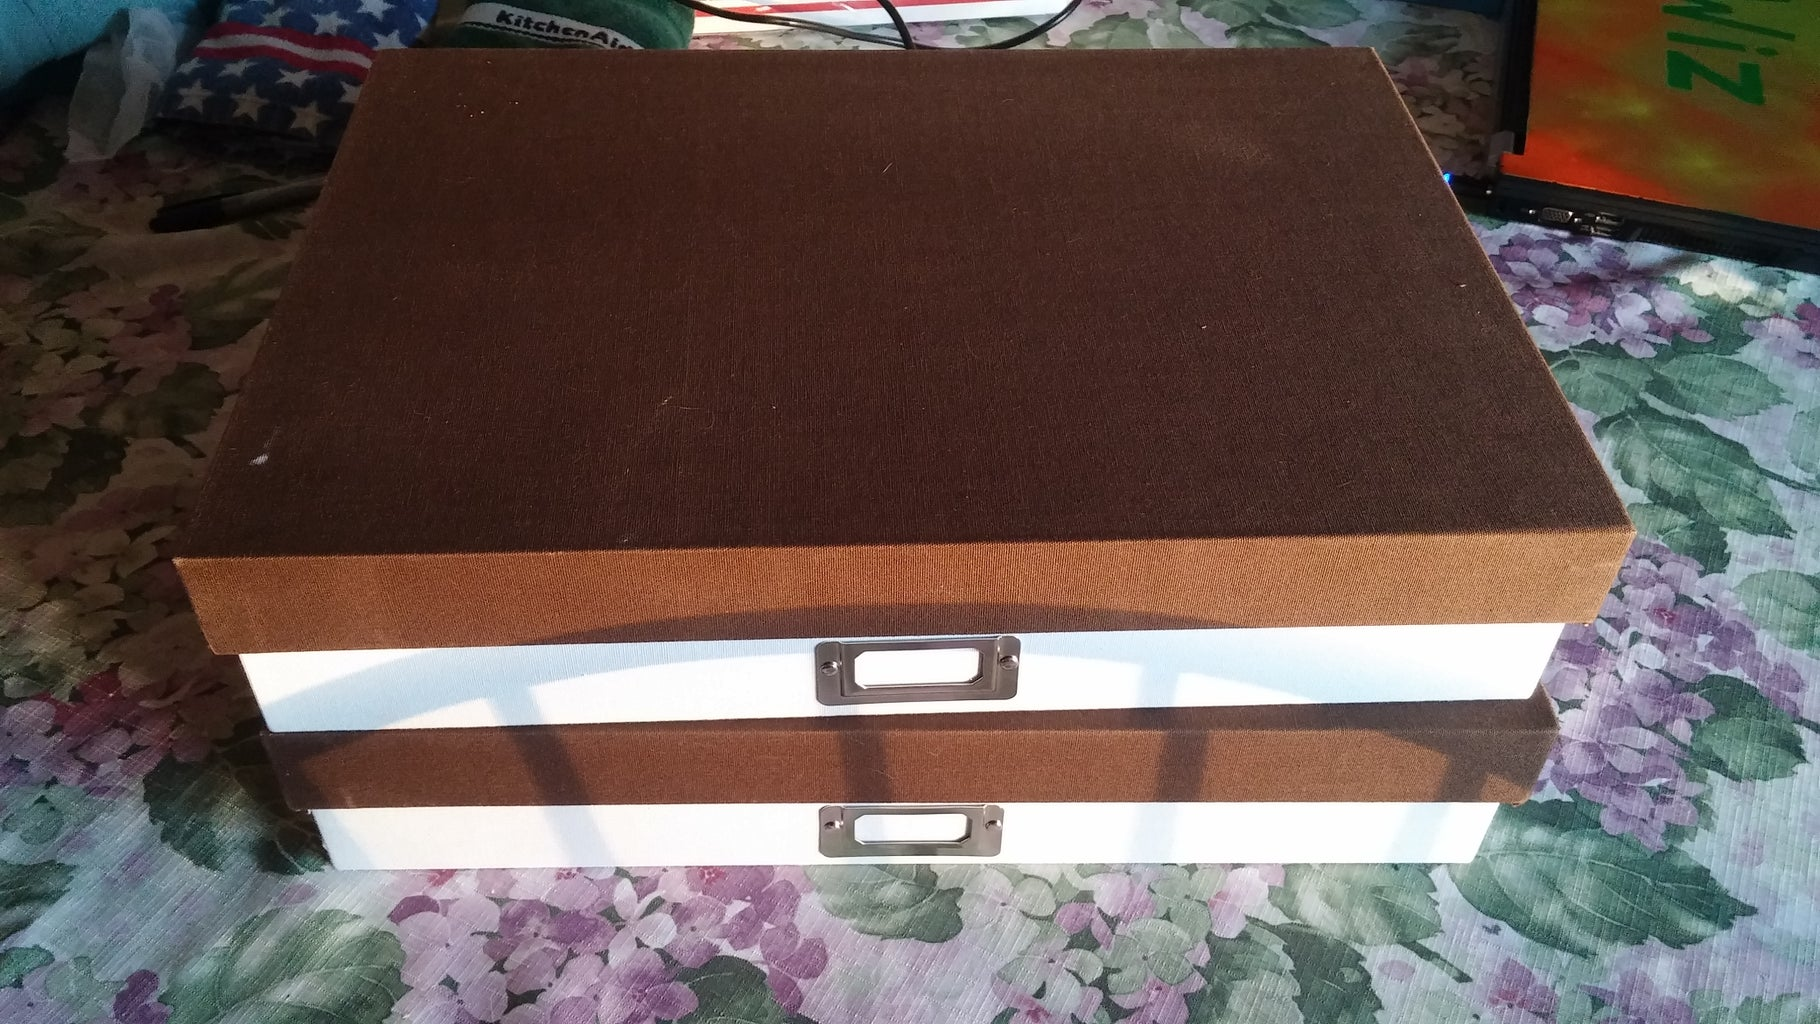 Step 1: Purchase Organizer Box